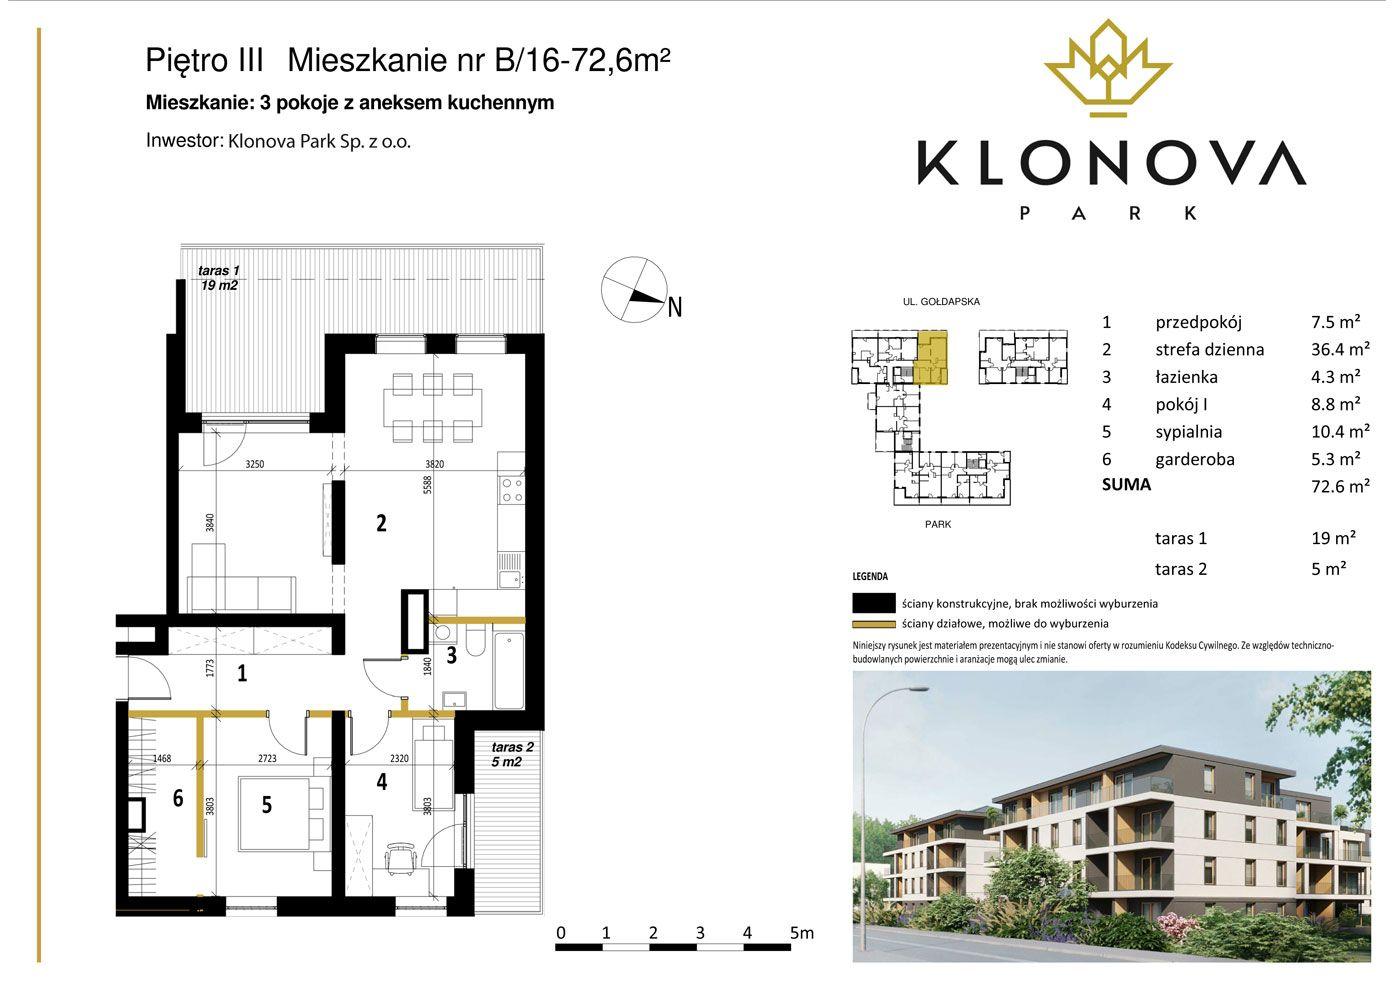 Apartamenty Klonova Park - Plan mieszkania B/16